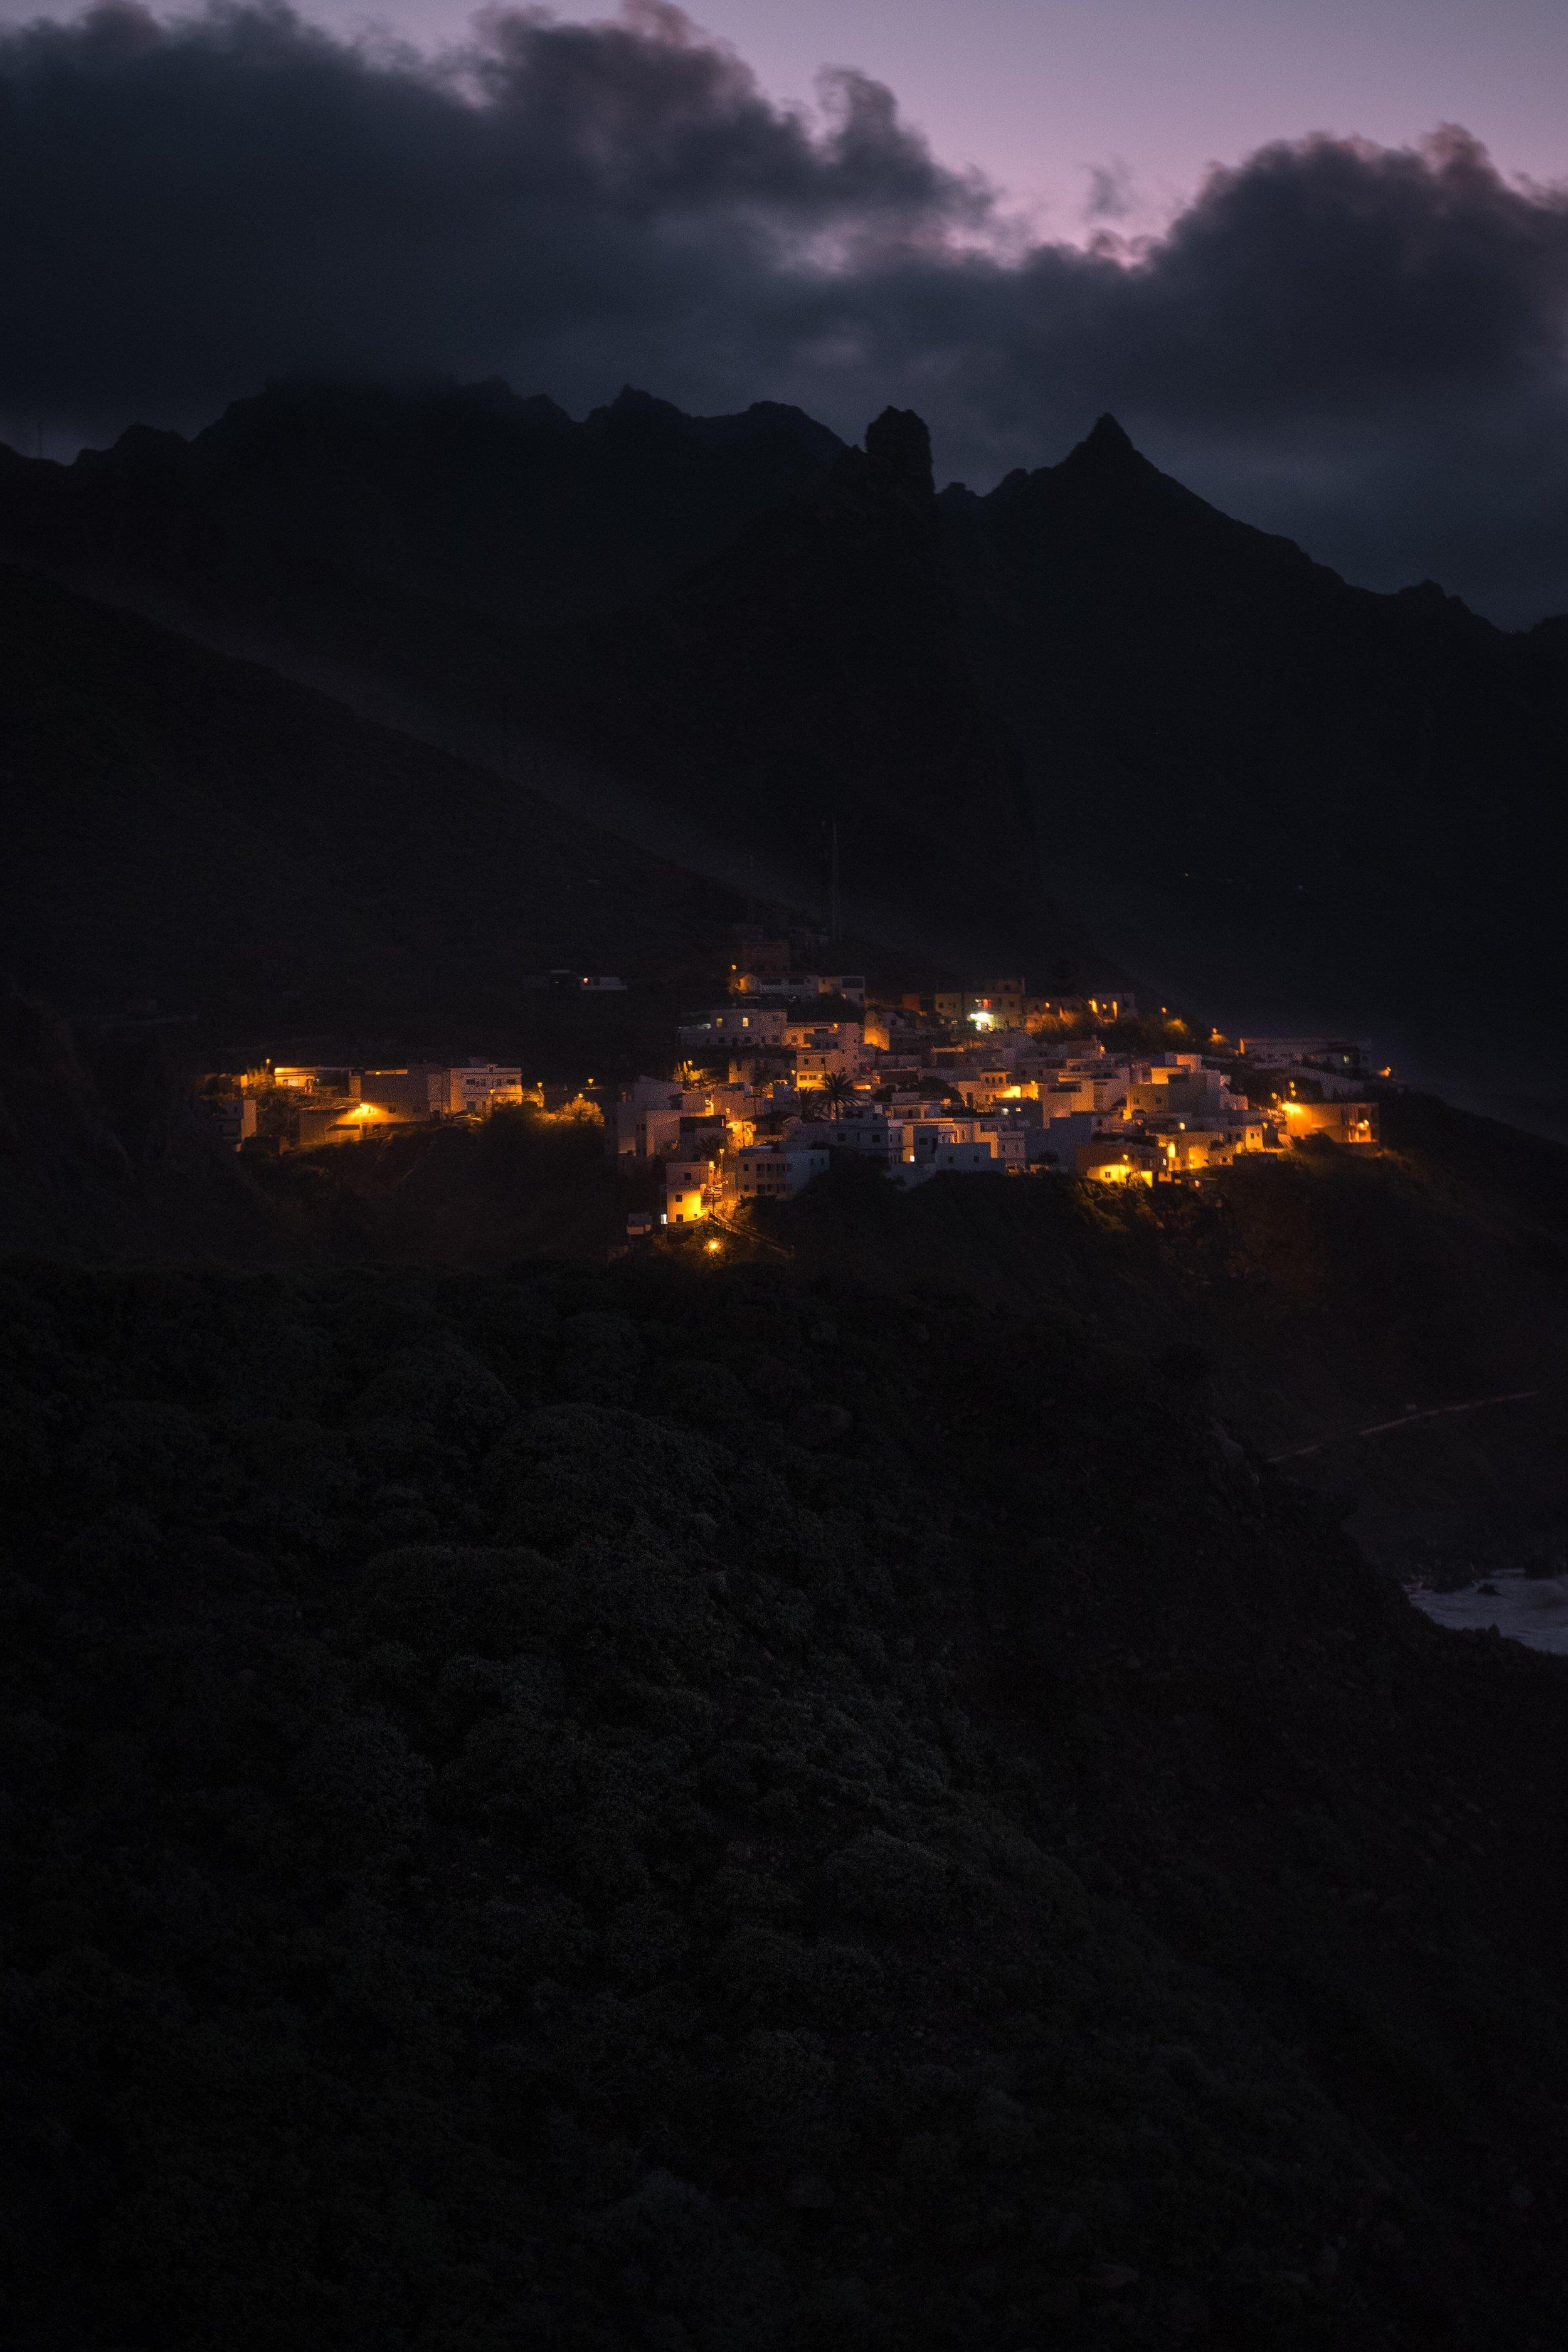 German Kholmov in Tenerife for Alter-View 12.jpg